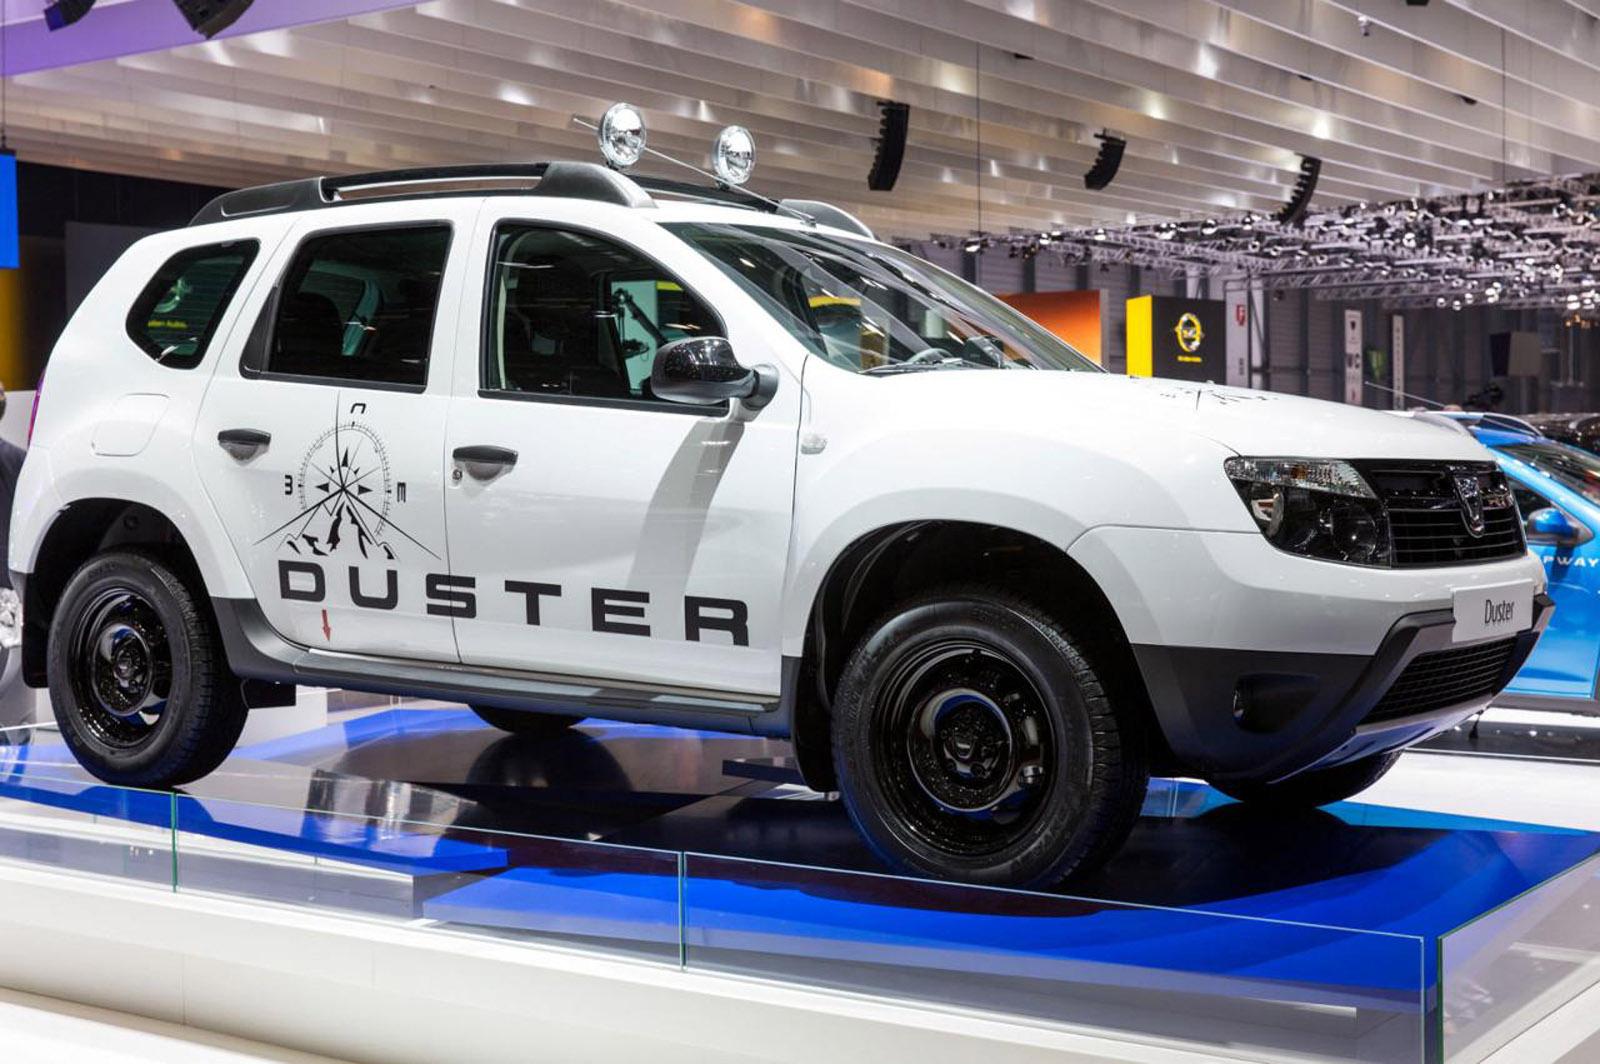 2013 Geneva Motor Show: Dacia Duster Adventure Edition  - фотография №1